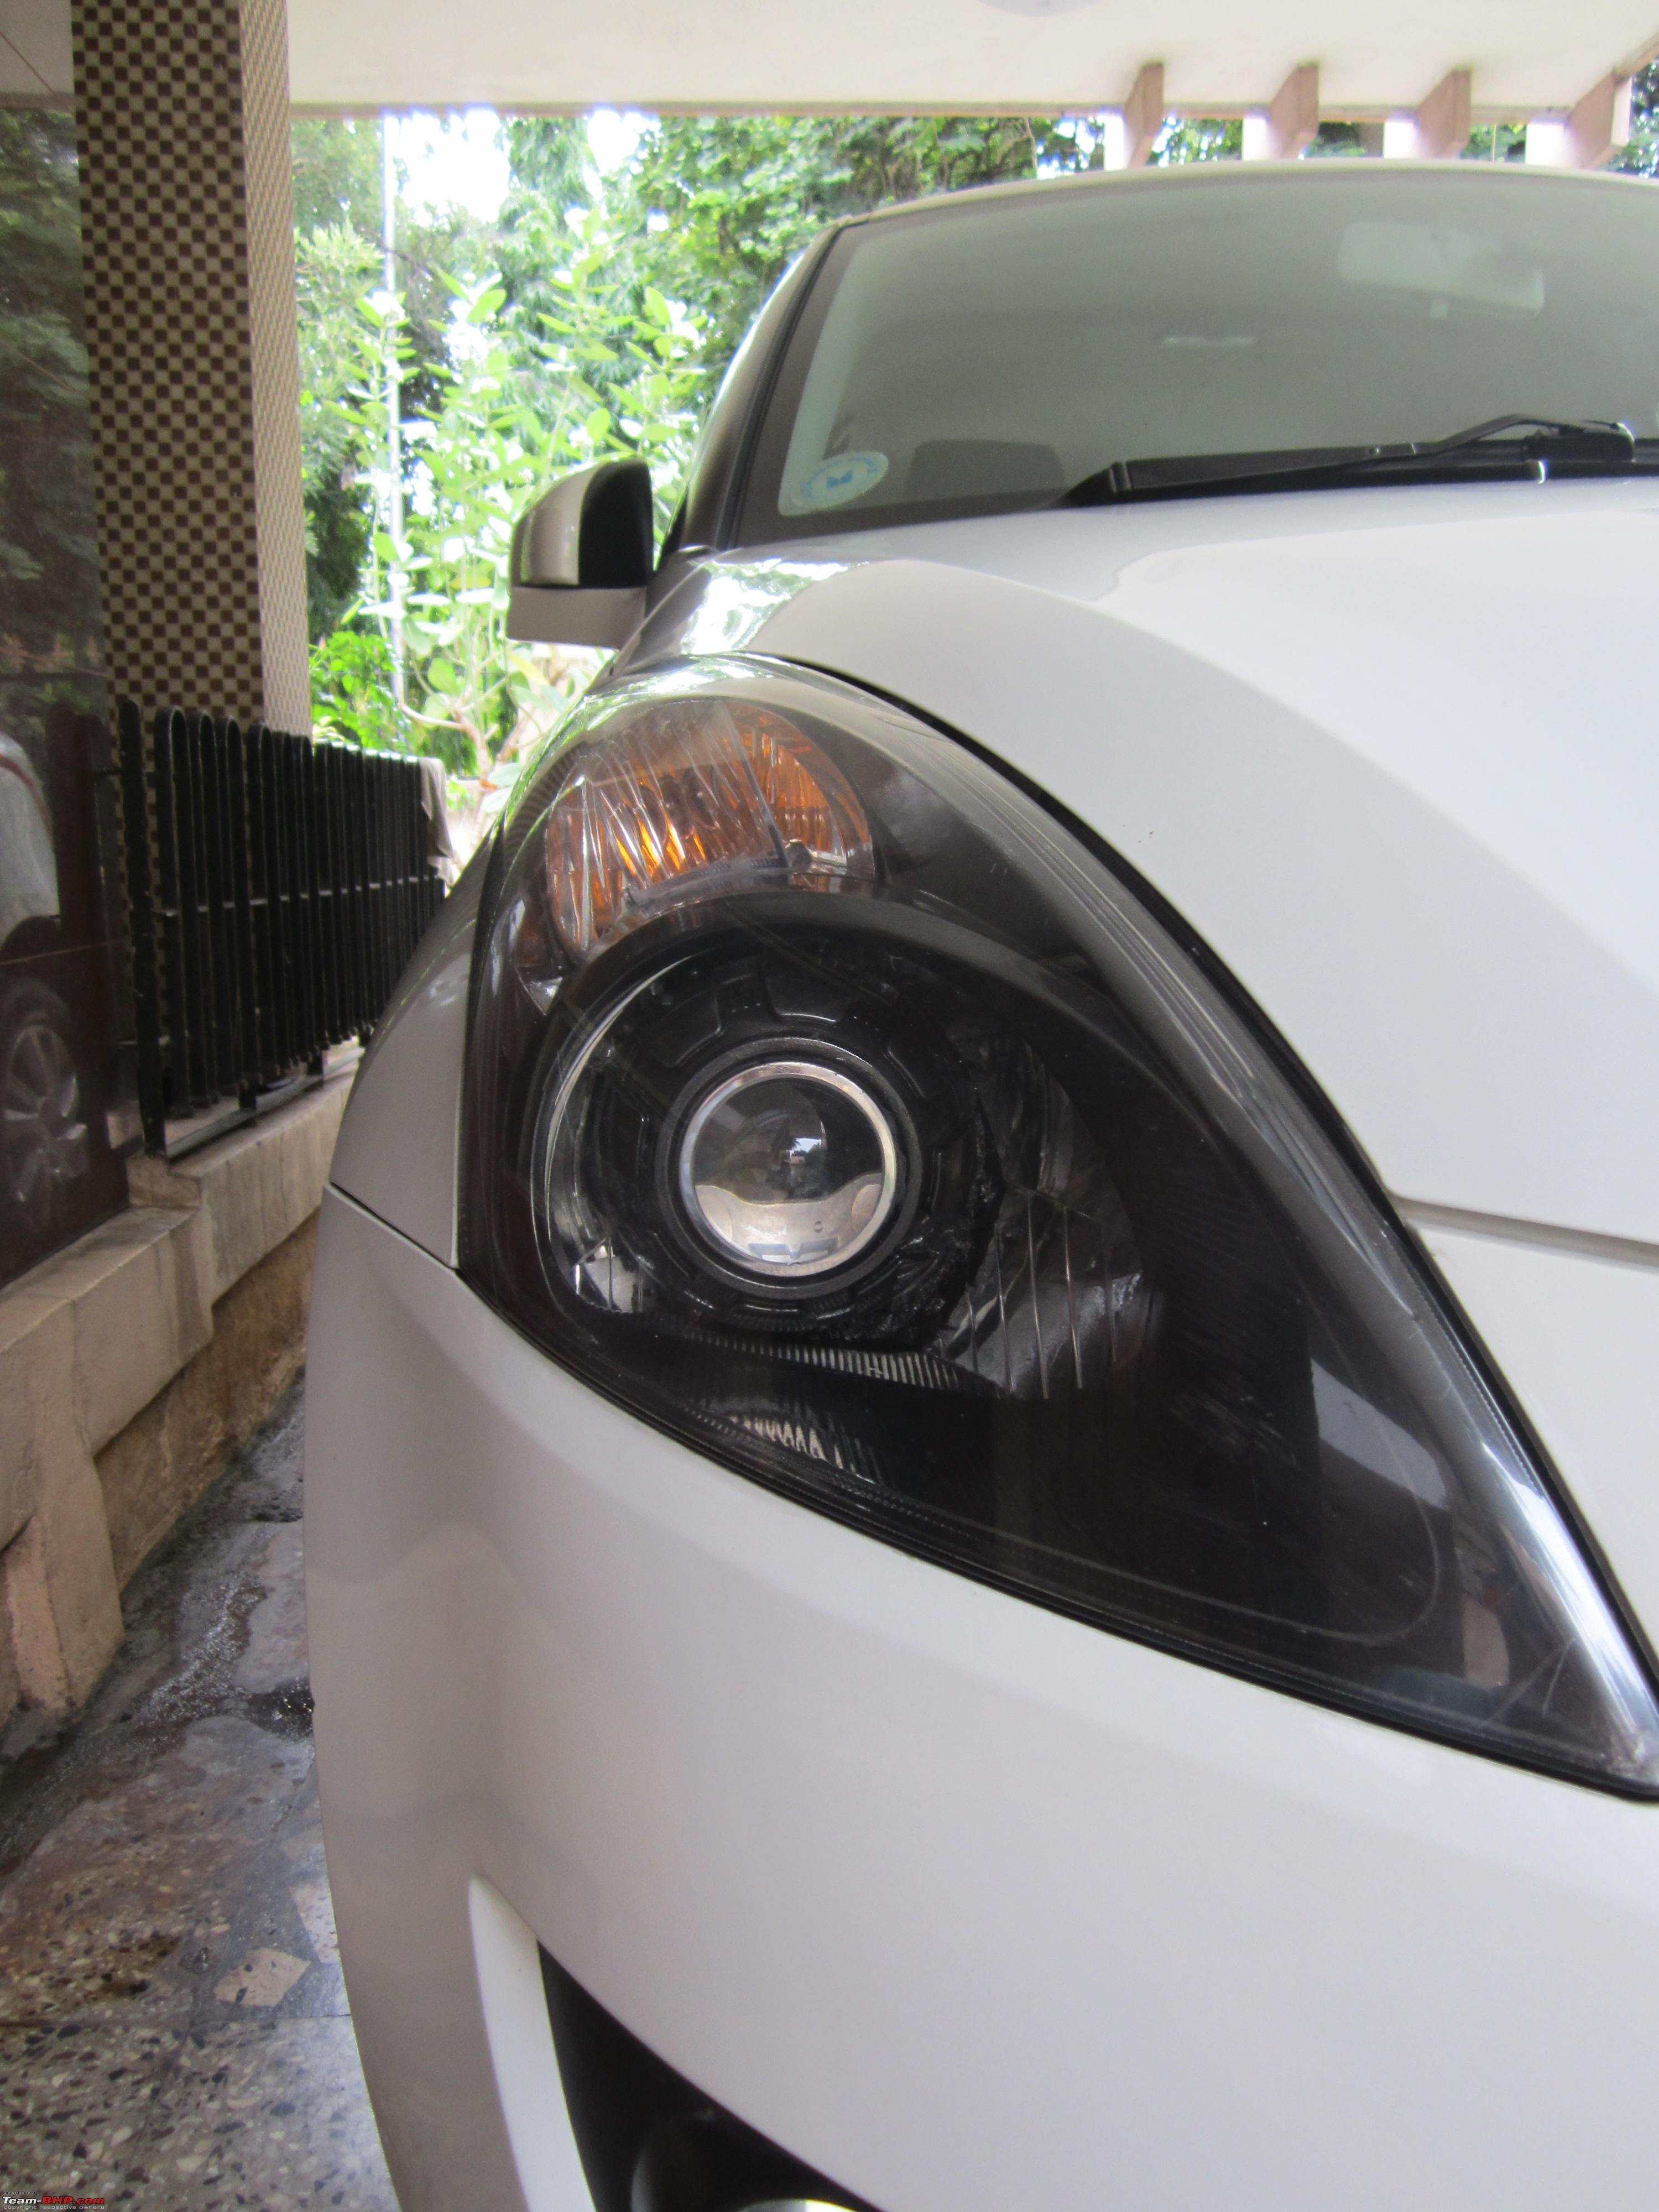 KS_6566] Free Wiring Diagram Suzuki Car Fx Wiring DiagramMang Terst Inki Alypt Impa Bios Oxyl Majo Norab Dylit Mepta Mohammedshrine  Librar Wiring 101